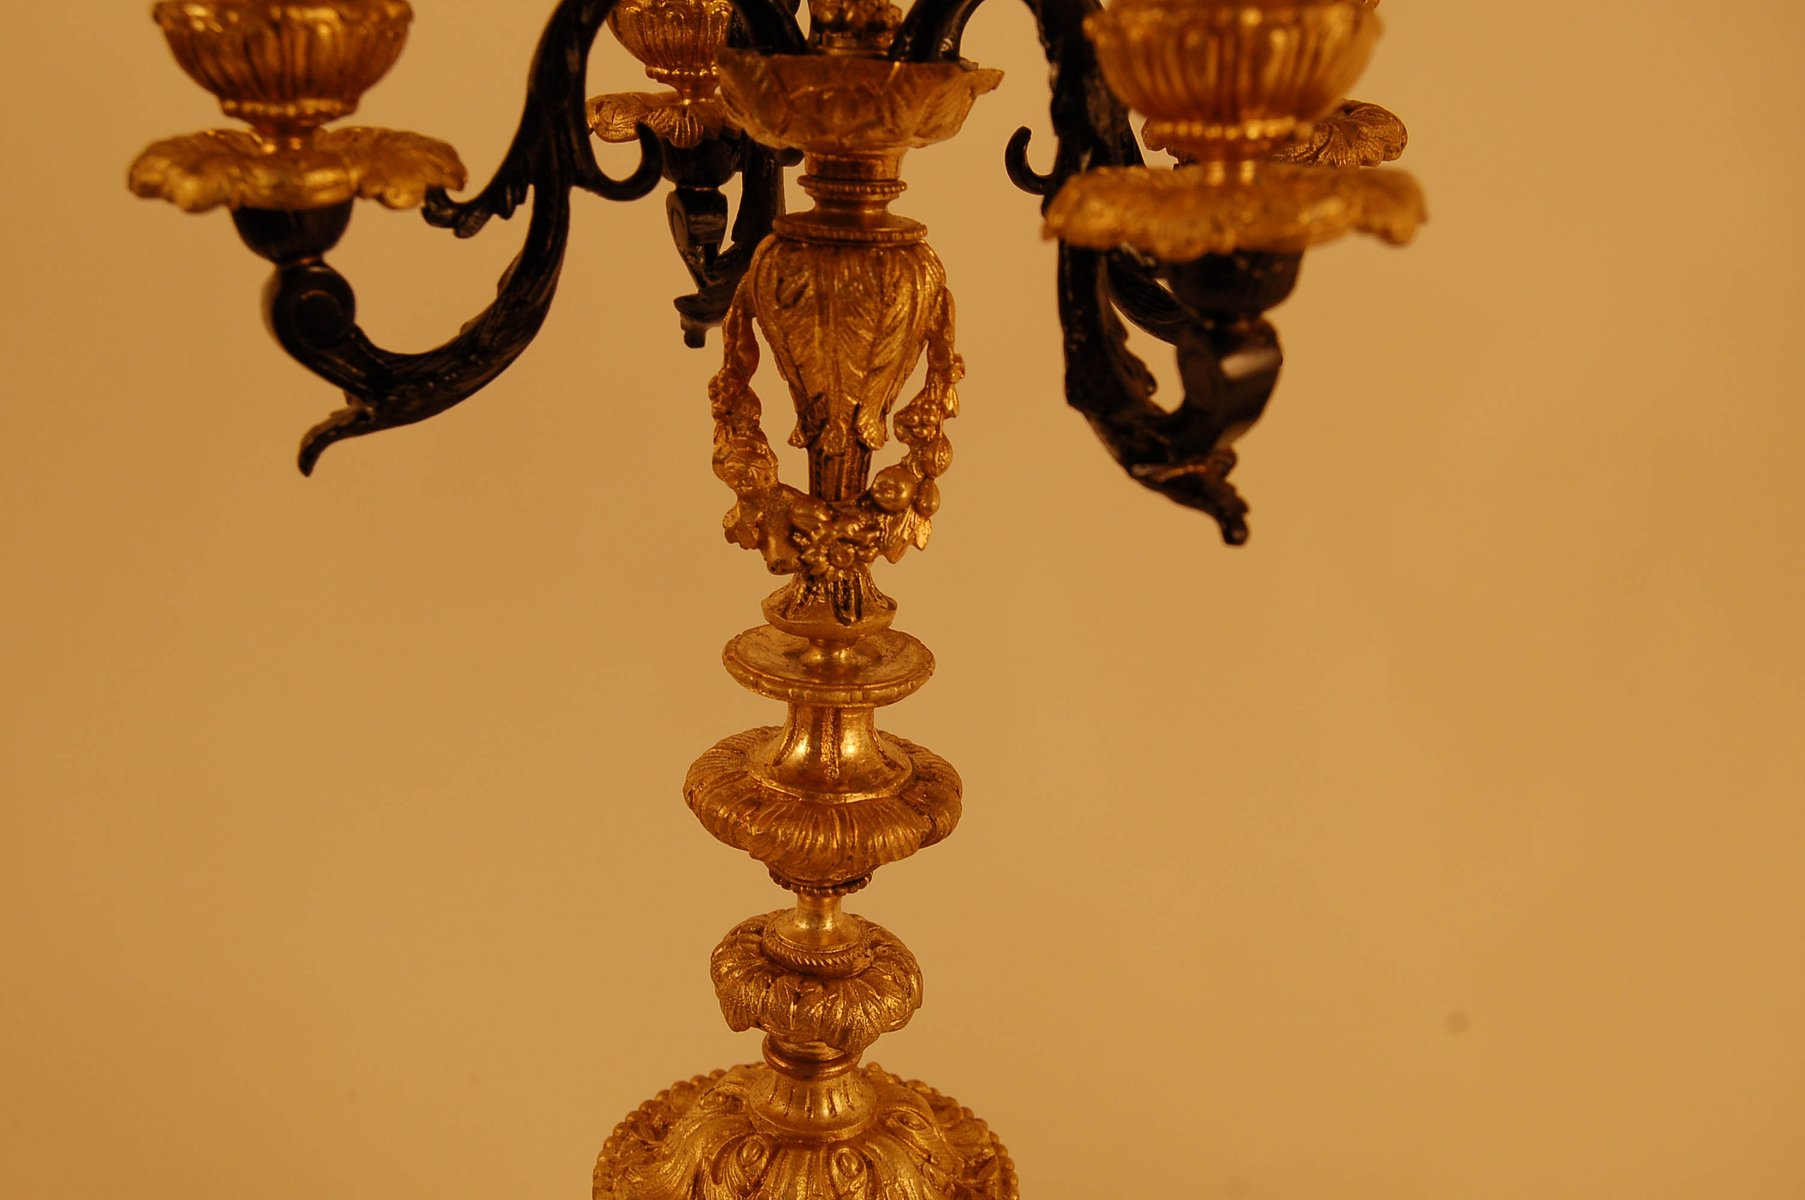 Kronleuchter Antik Porzellan ~ Antike kronleuchter aus bronze porzellan er set bei pamono kaufen